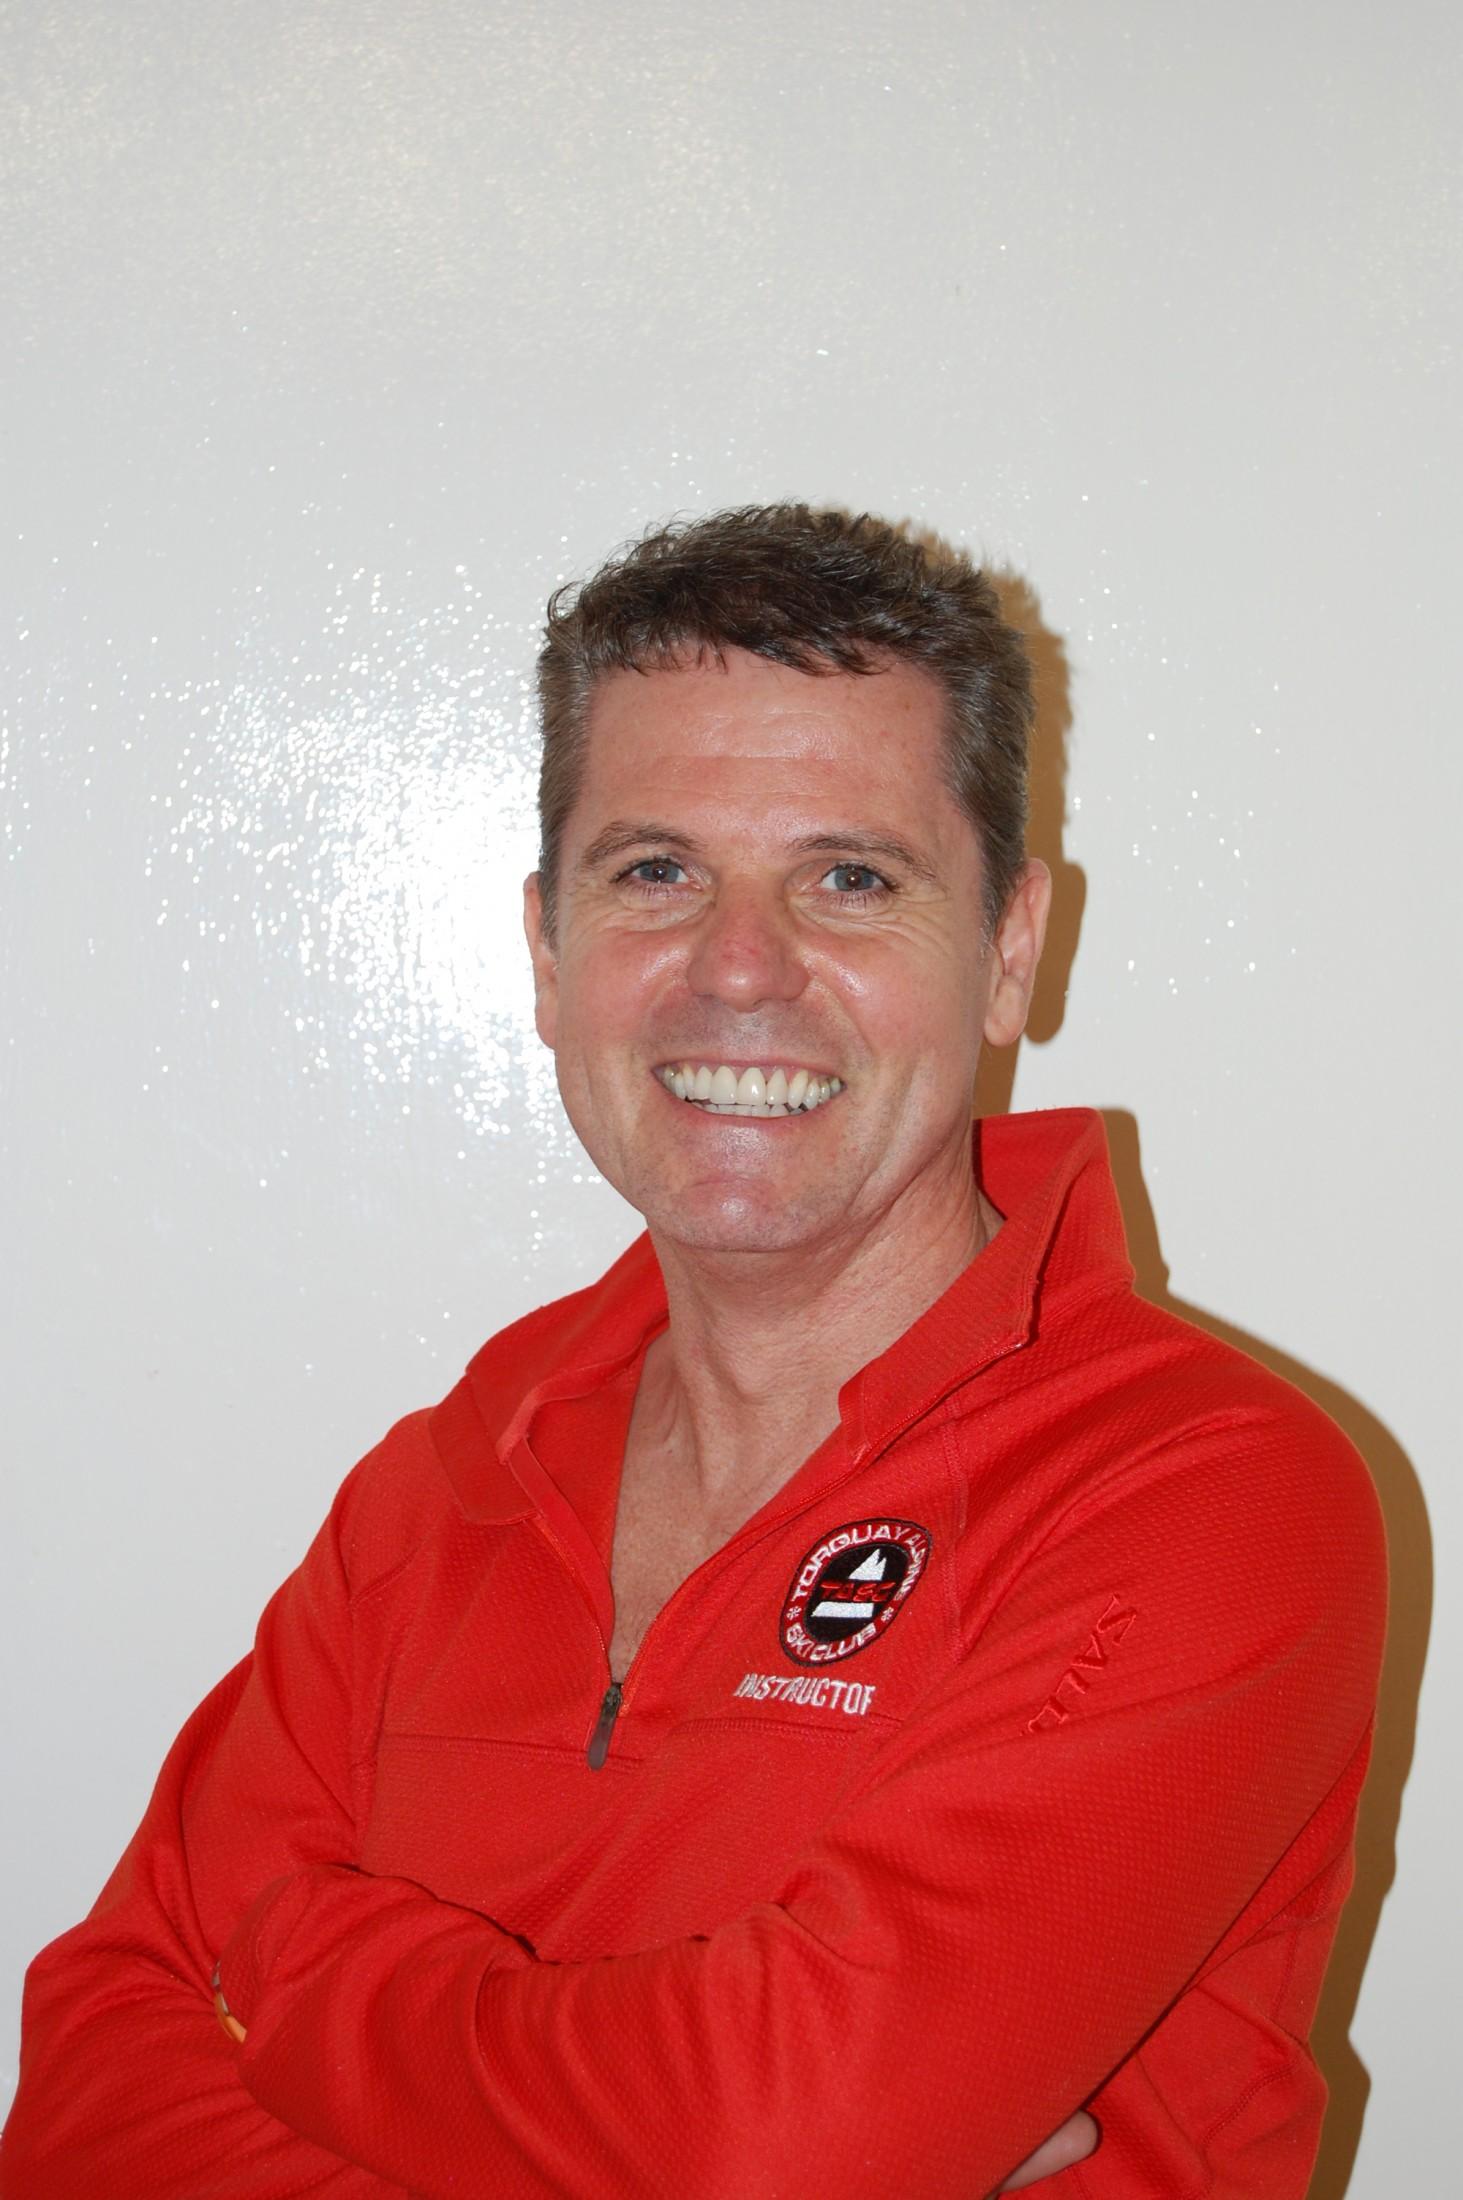 Chris Norton